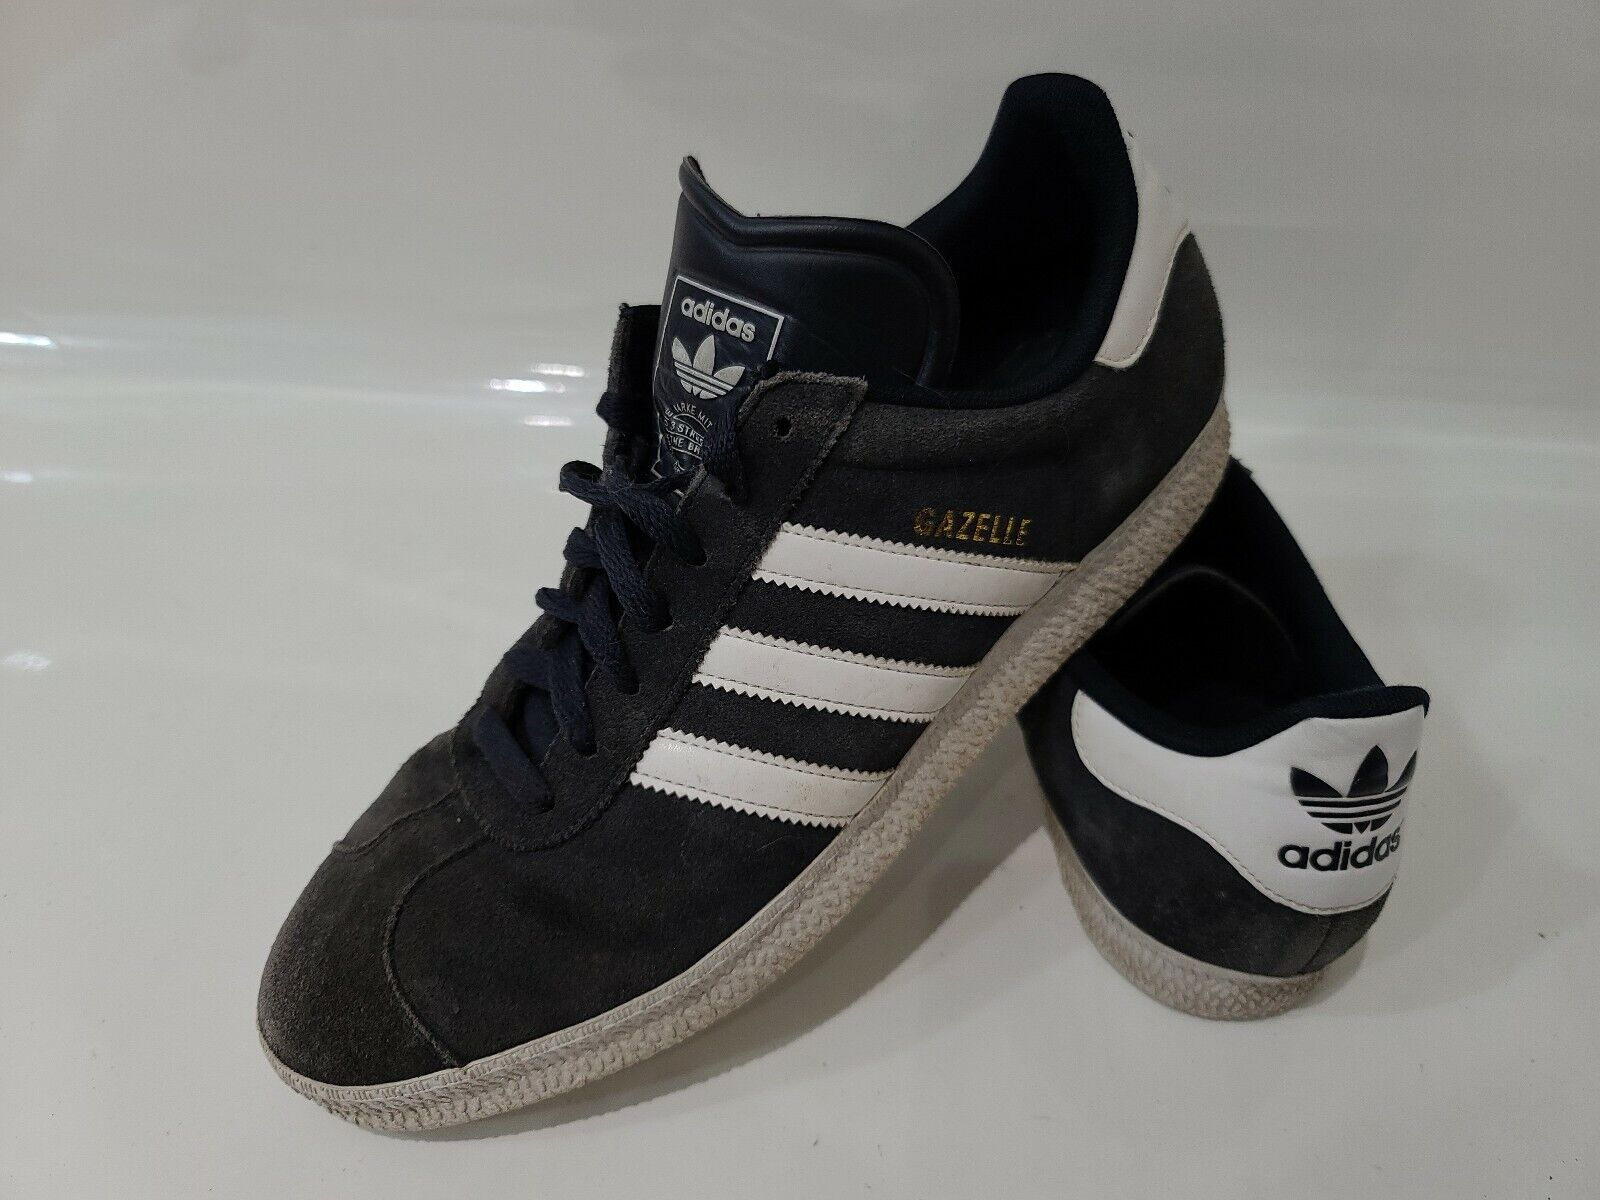 Size 10 - adidas Gazelle 2 Blue - Q23101 for sale online   eBay